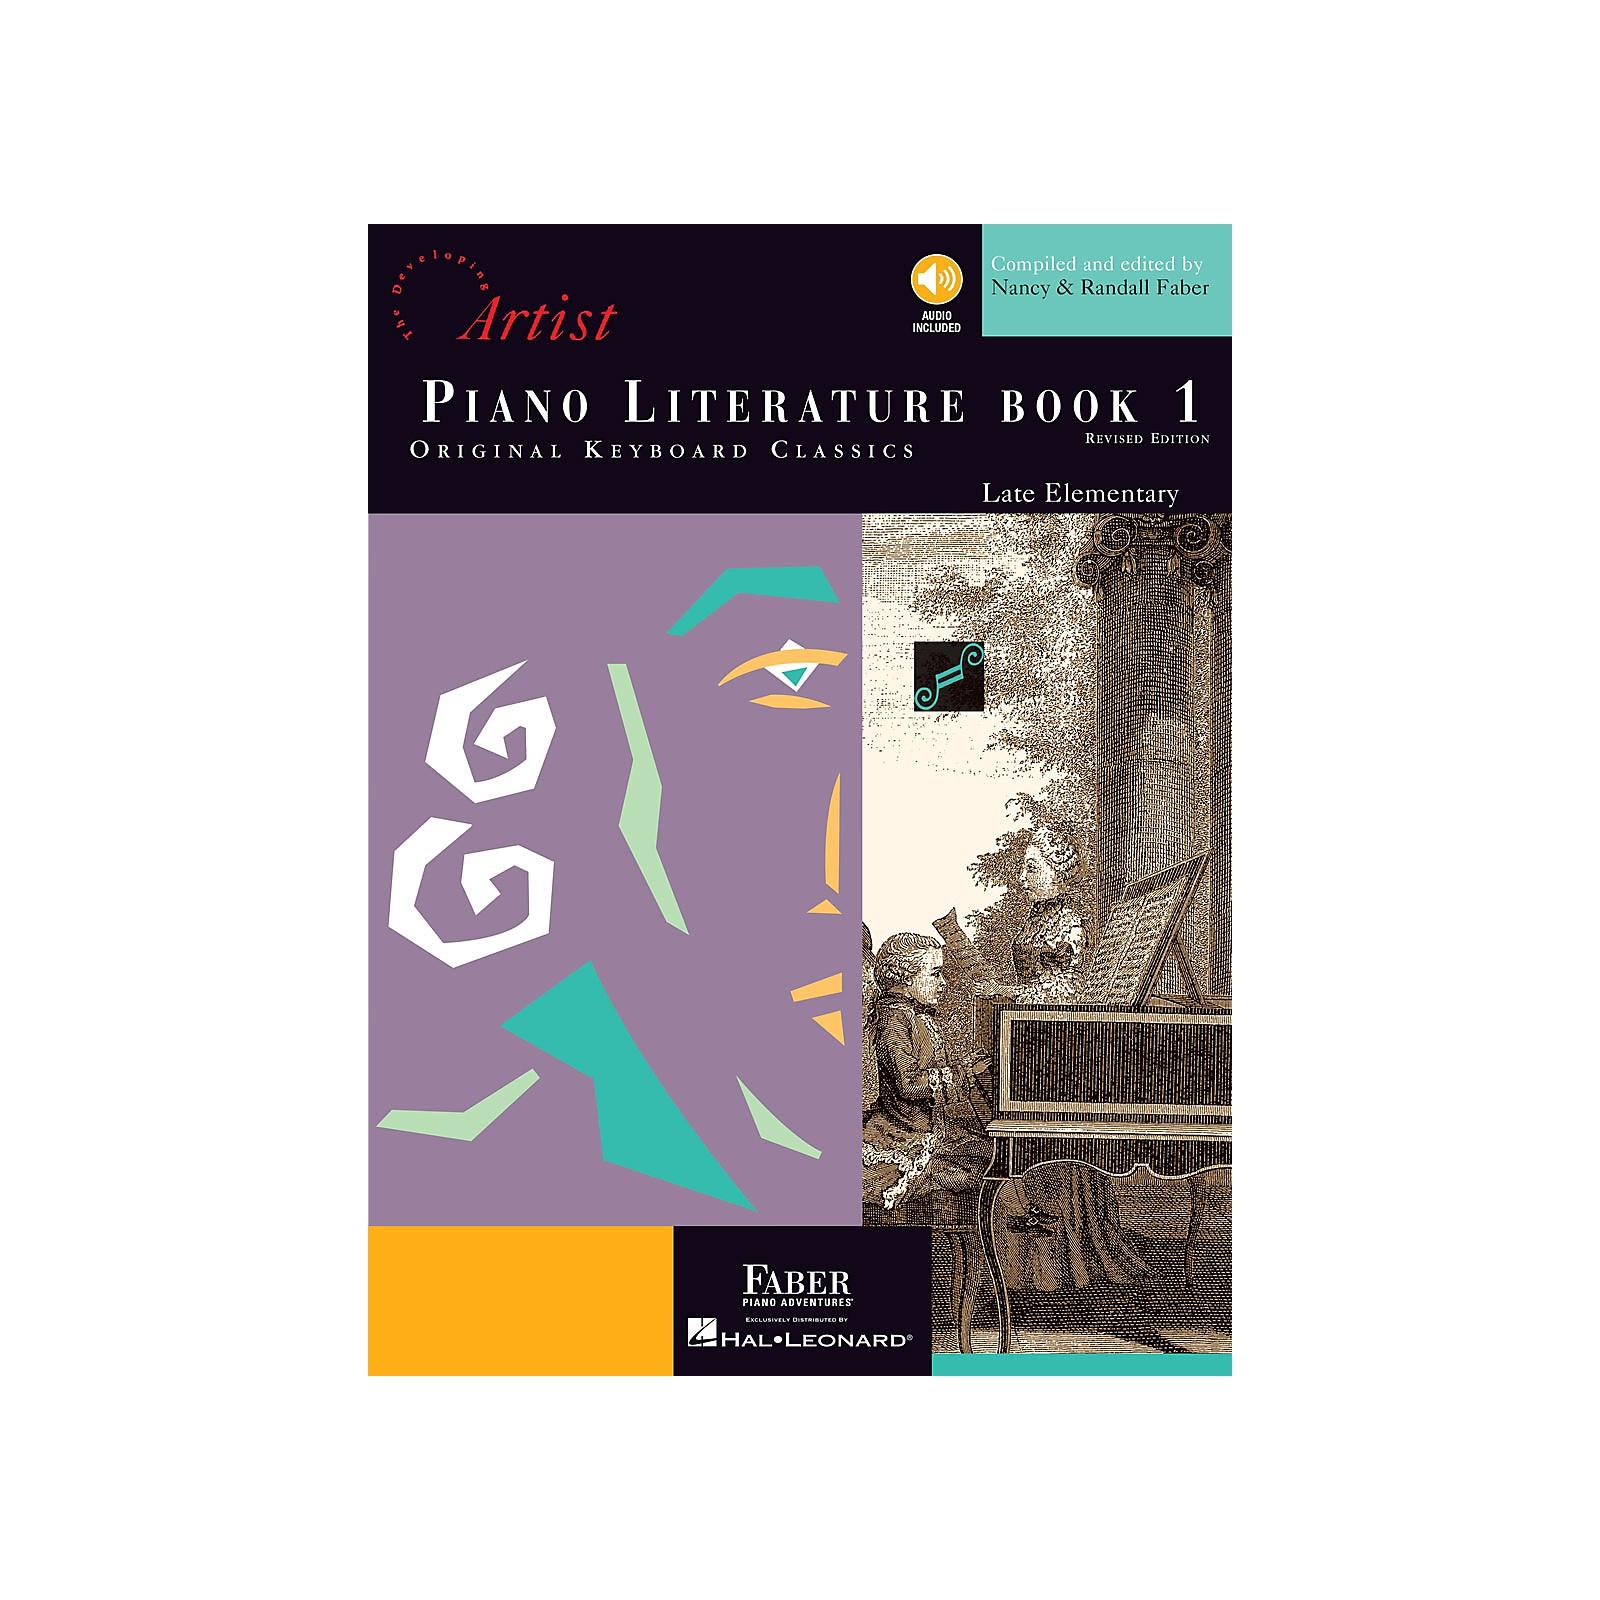 Faber Piano Adventures Piano Literature - Book 1 Developing Artist Original Keyboard Classics Book with CD